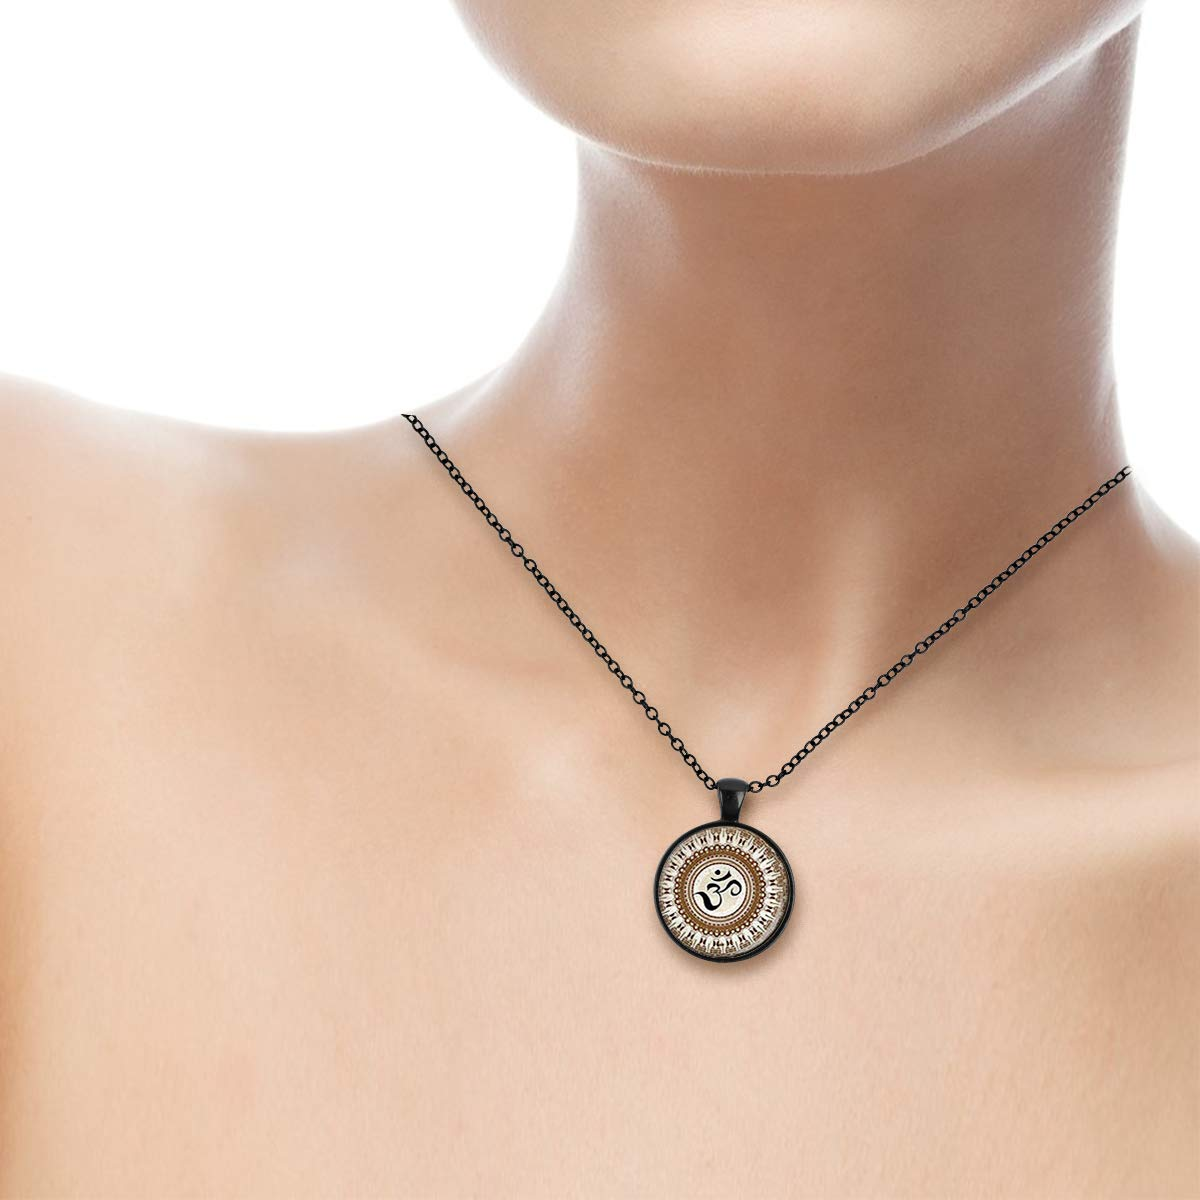 Flower of Life Art Zen Yoga Pendant Necklace Vintage Bronze Chain Statement Necklace Handmade Jewelry Gifts